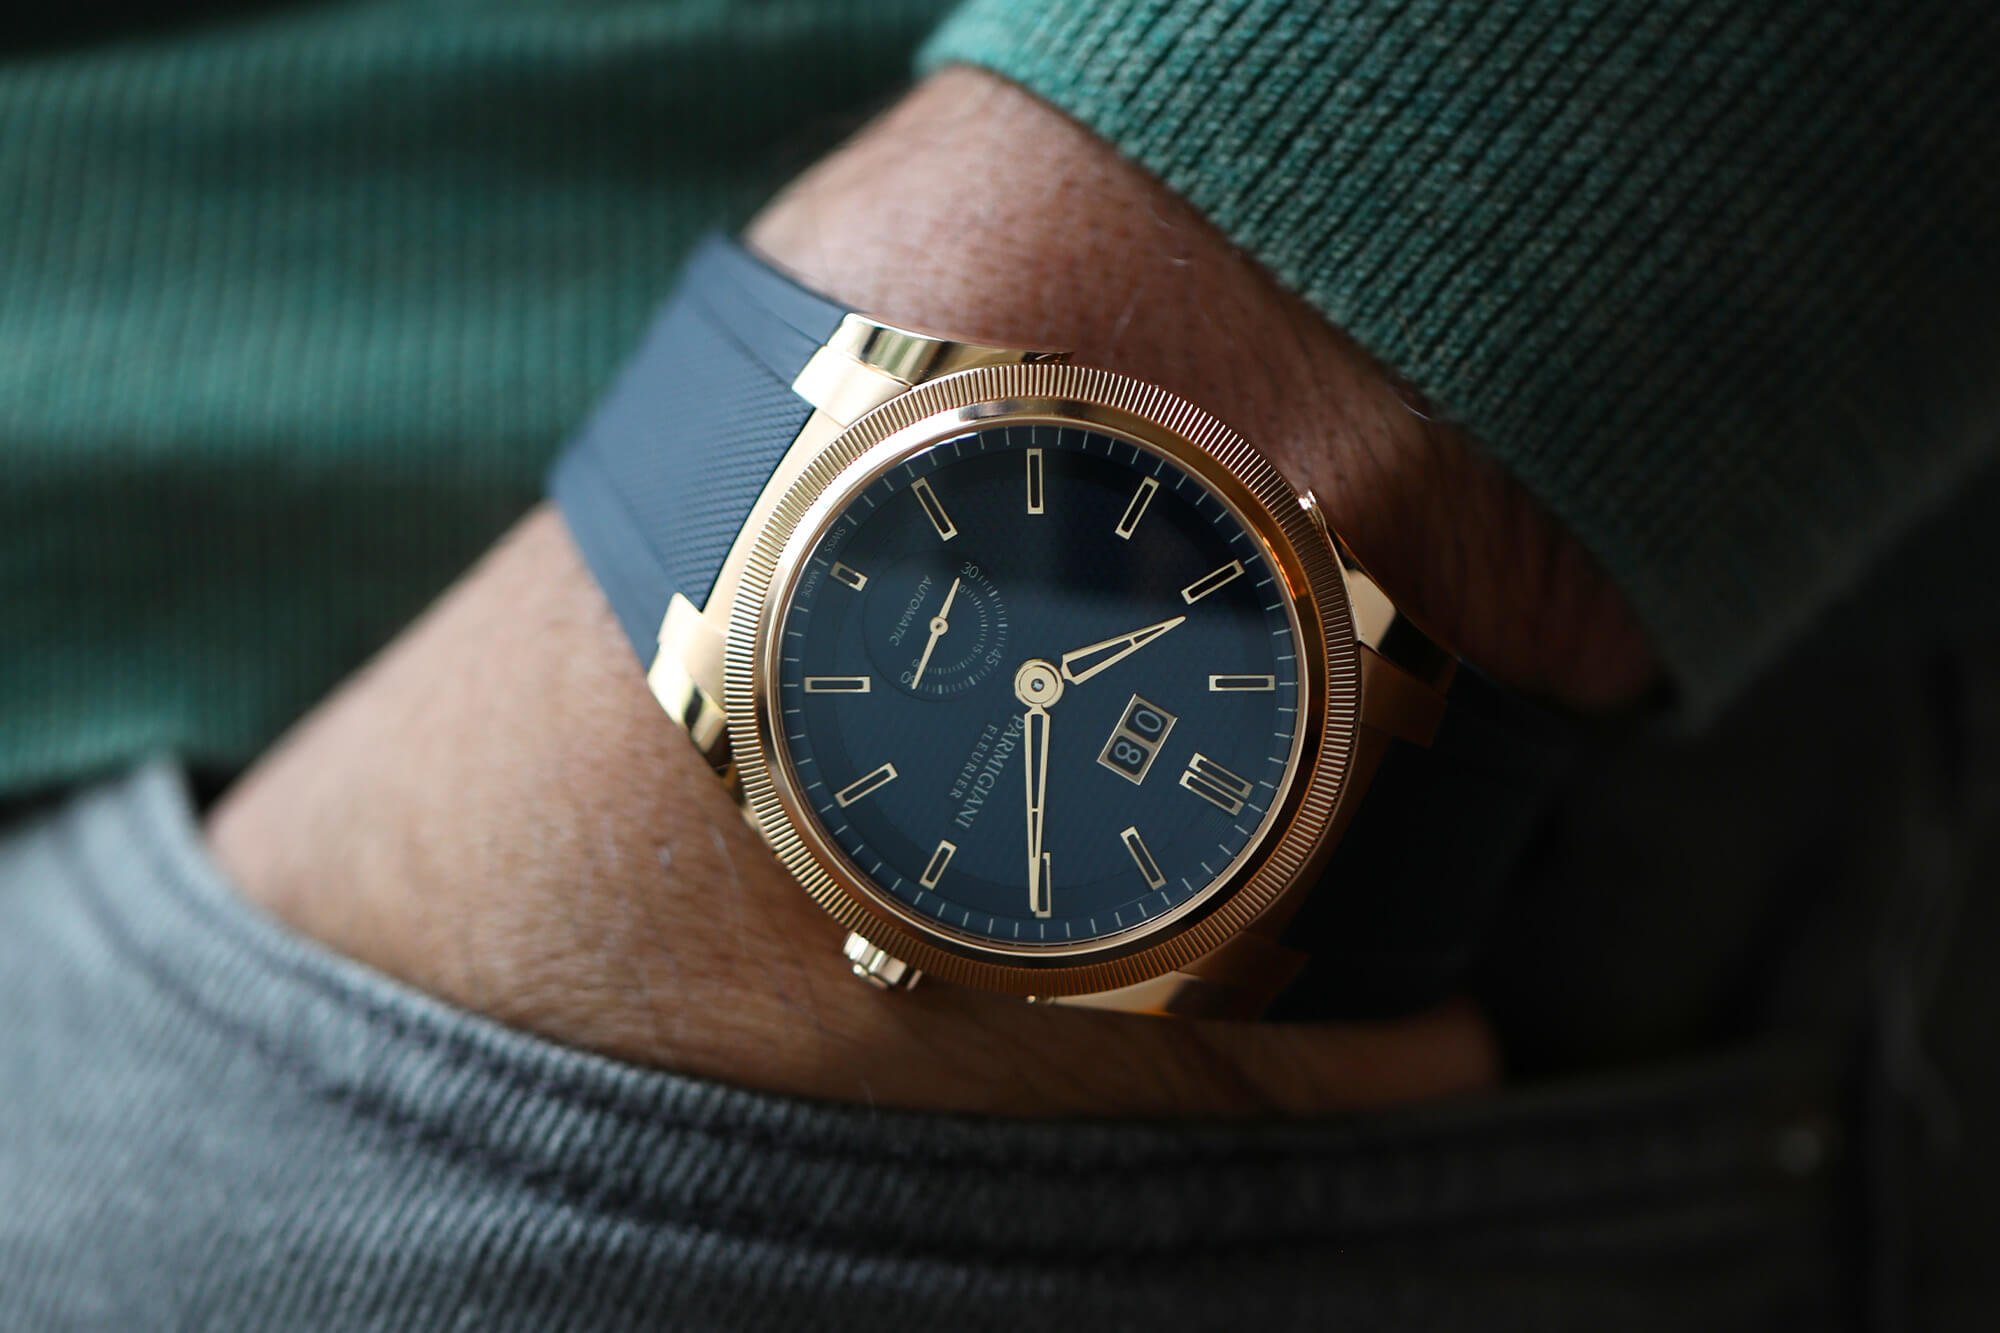 Stunning Parmigiani Fleurier Tonda Watches You Should Buy